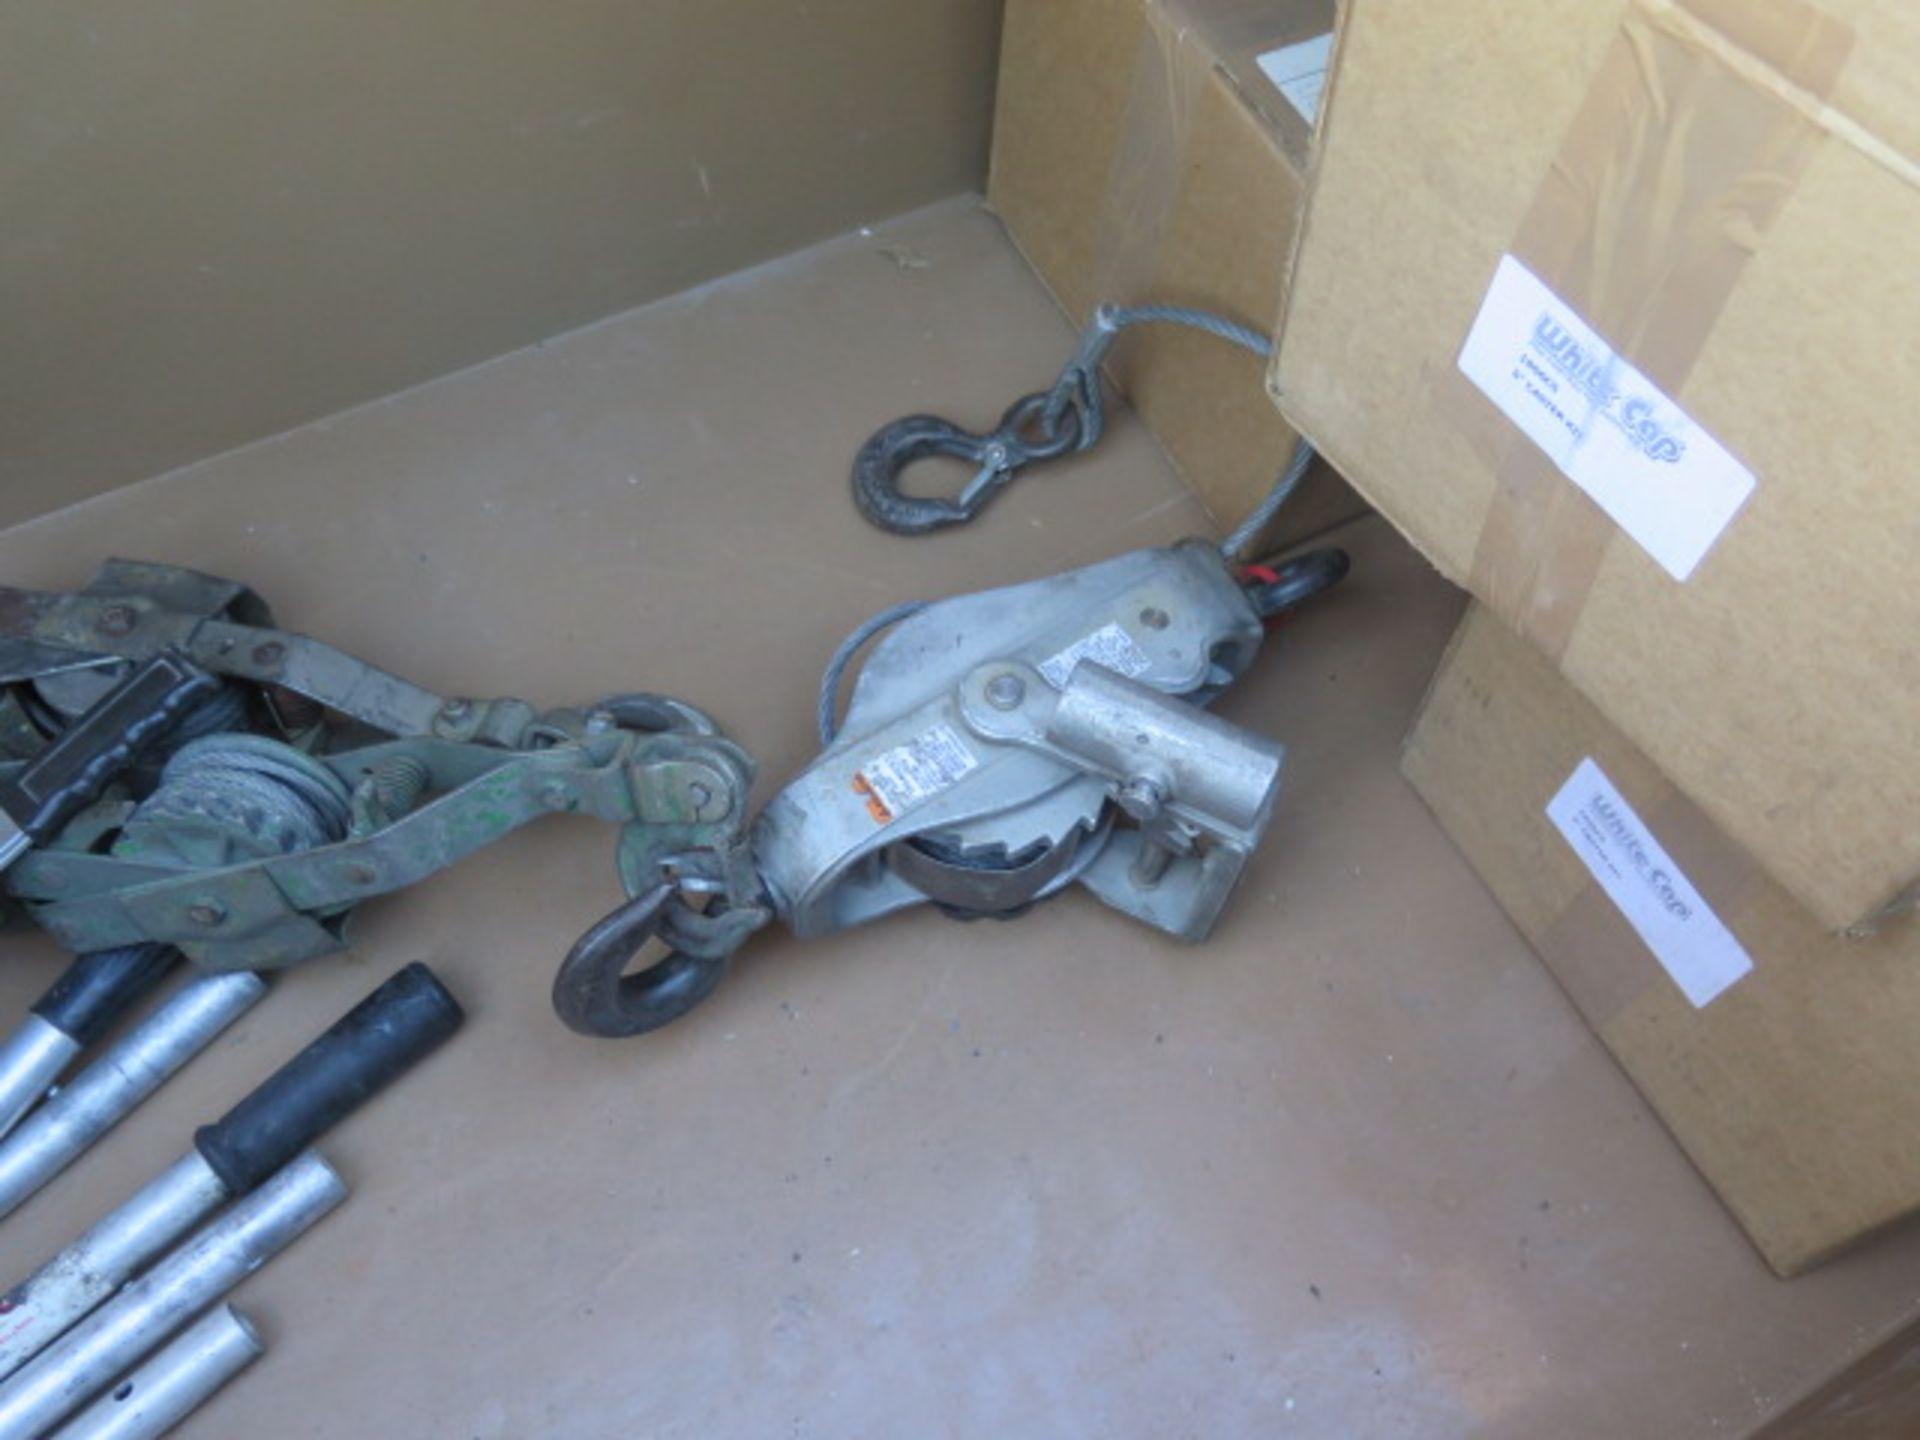 Knaack mdl. 89 Storagemaster Rolling Job Box w/ Come-Alongs (SOLD AS-IS - NO WARRANTY) - Image 9 of 12